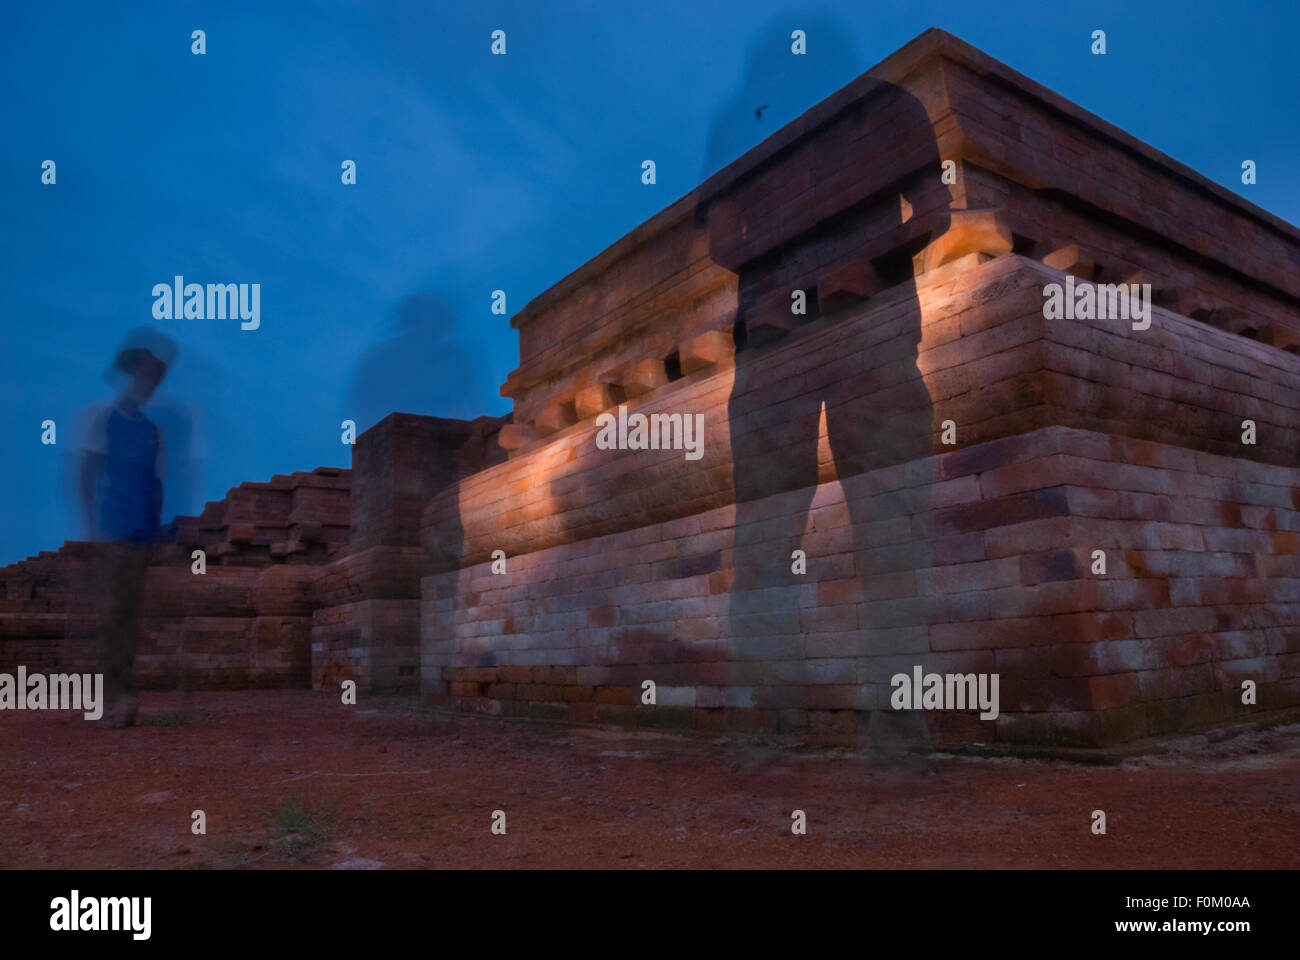 People illuminating ancient temple. - Stock Image